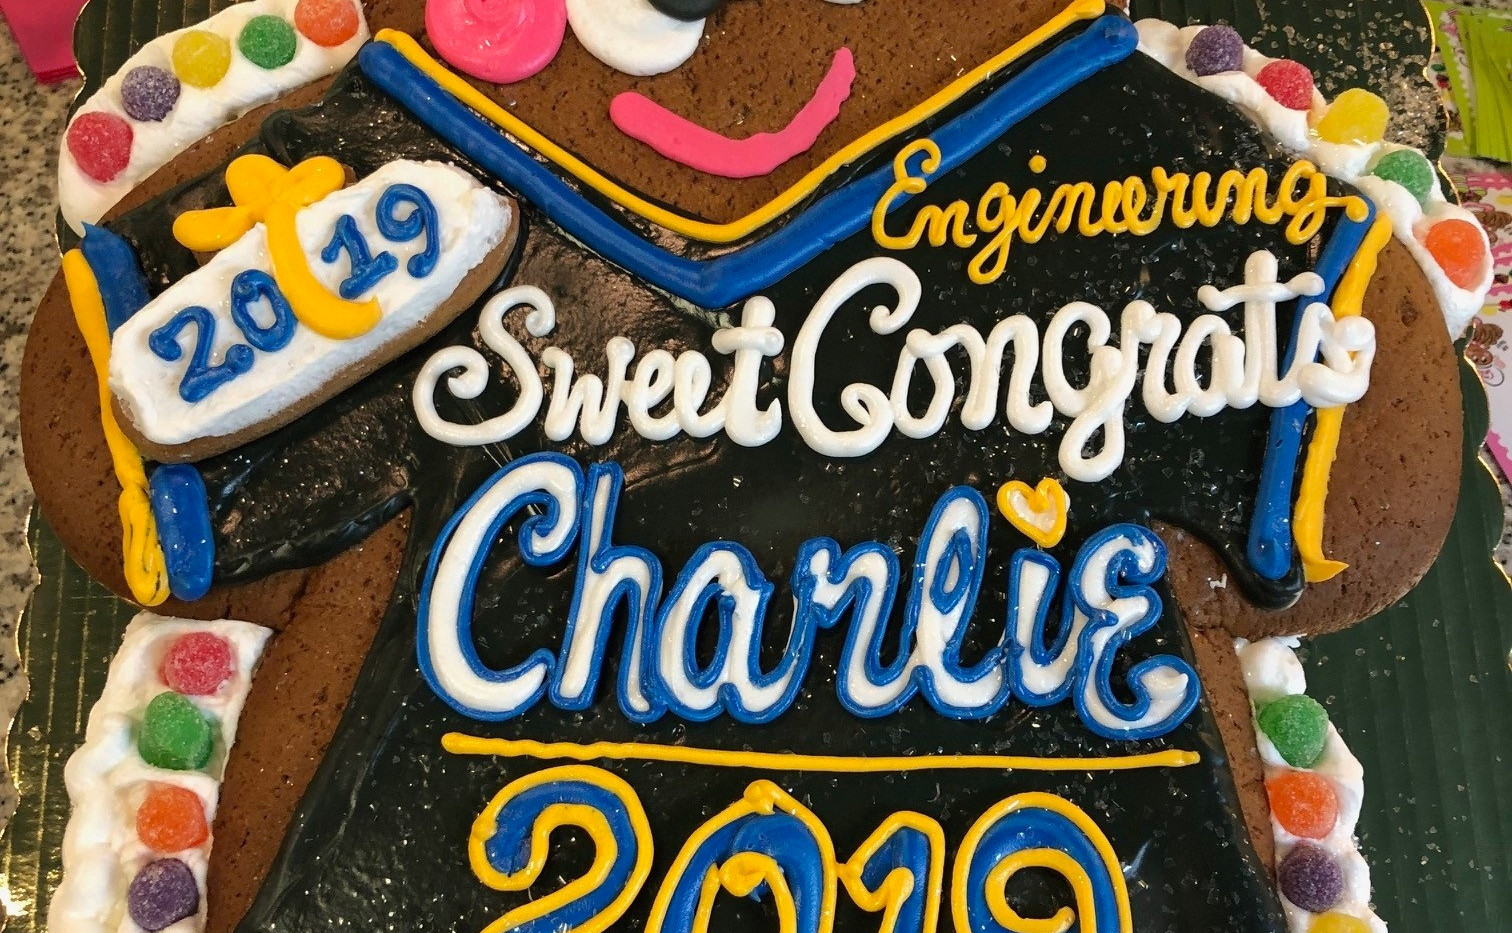 XL GB Boy Graduate Ginger Charlie 2019 I